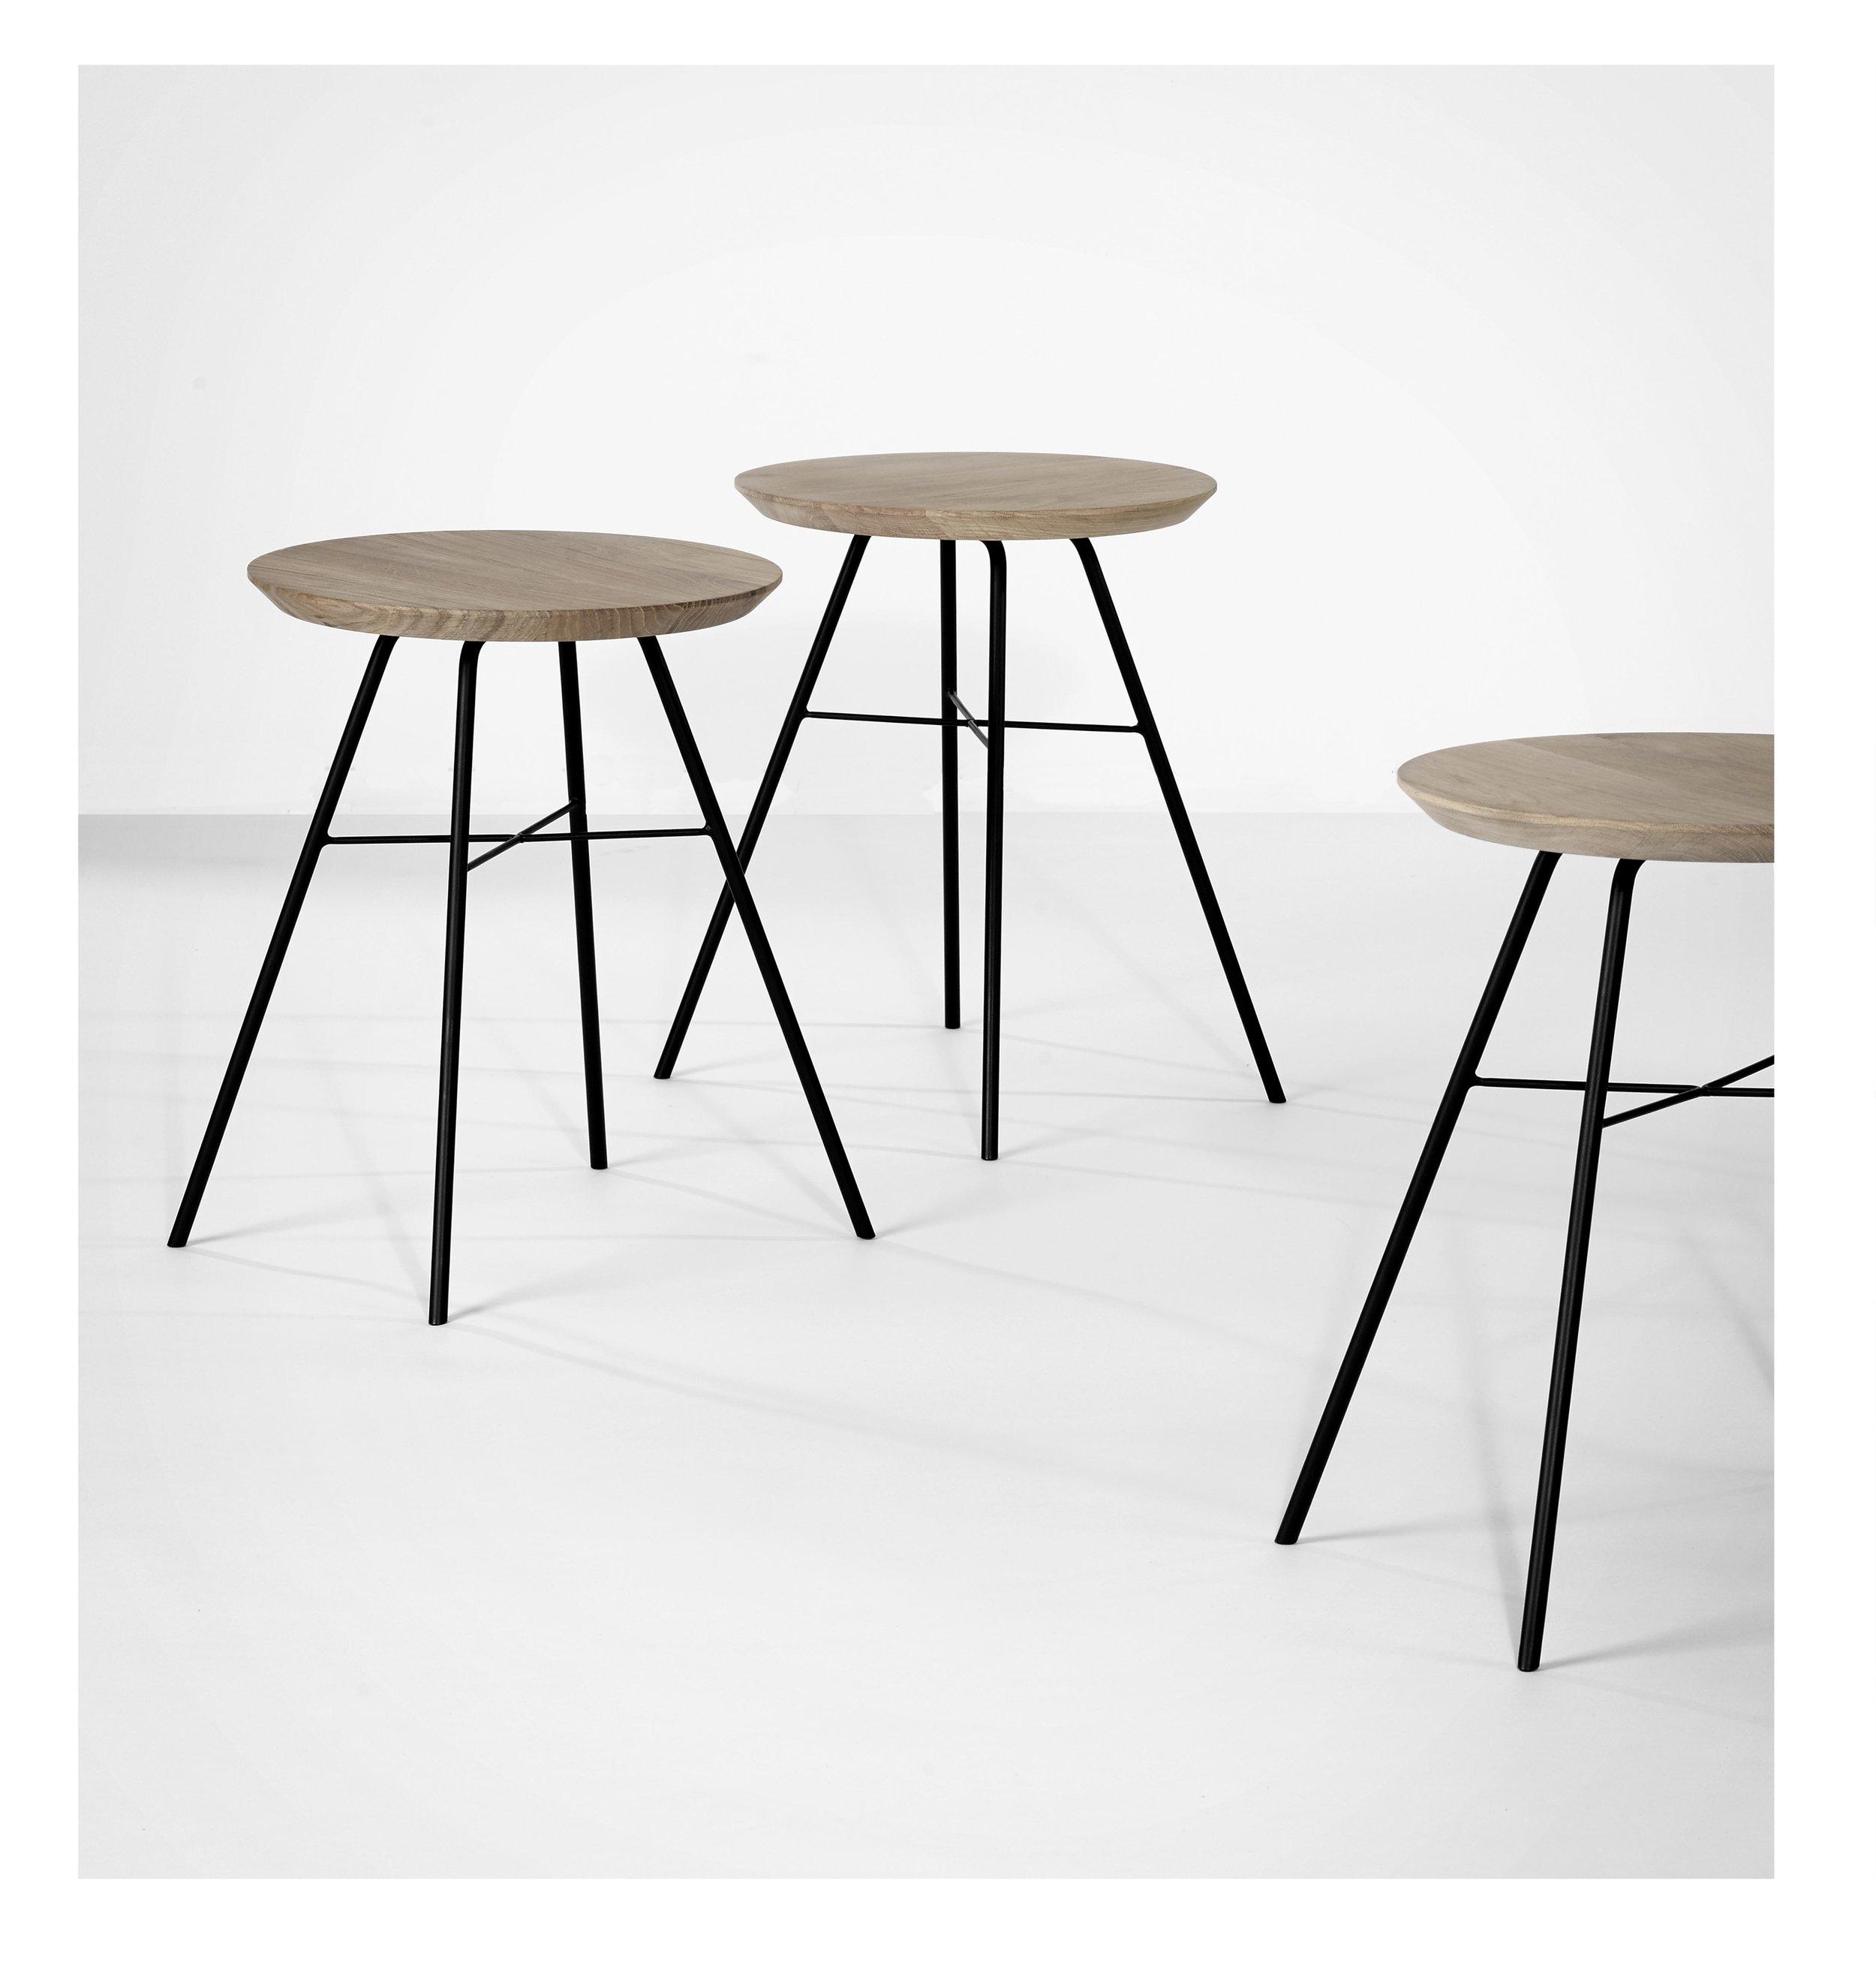 026614-Disc-stools.jpg